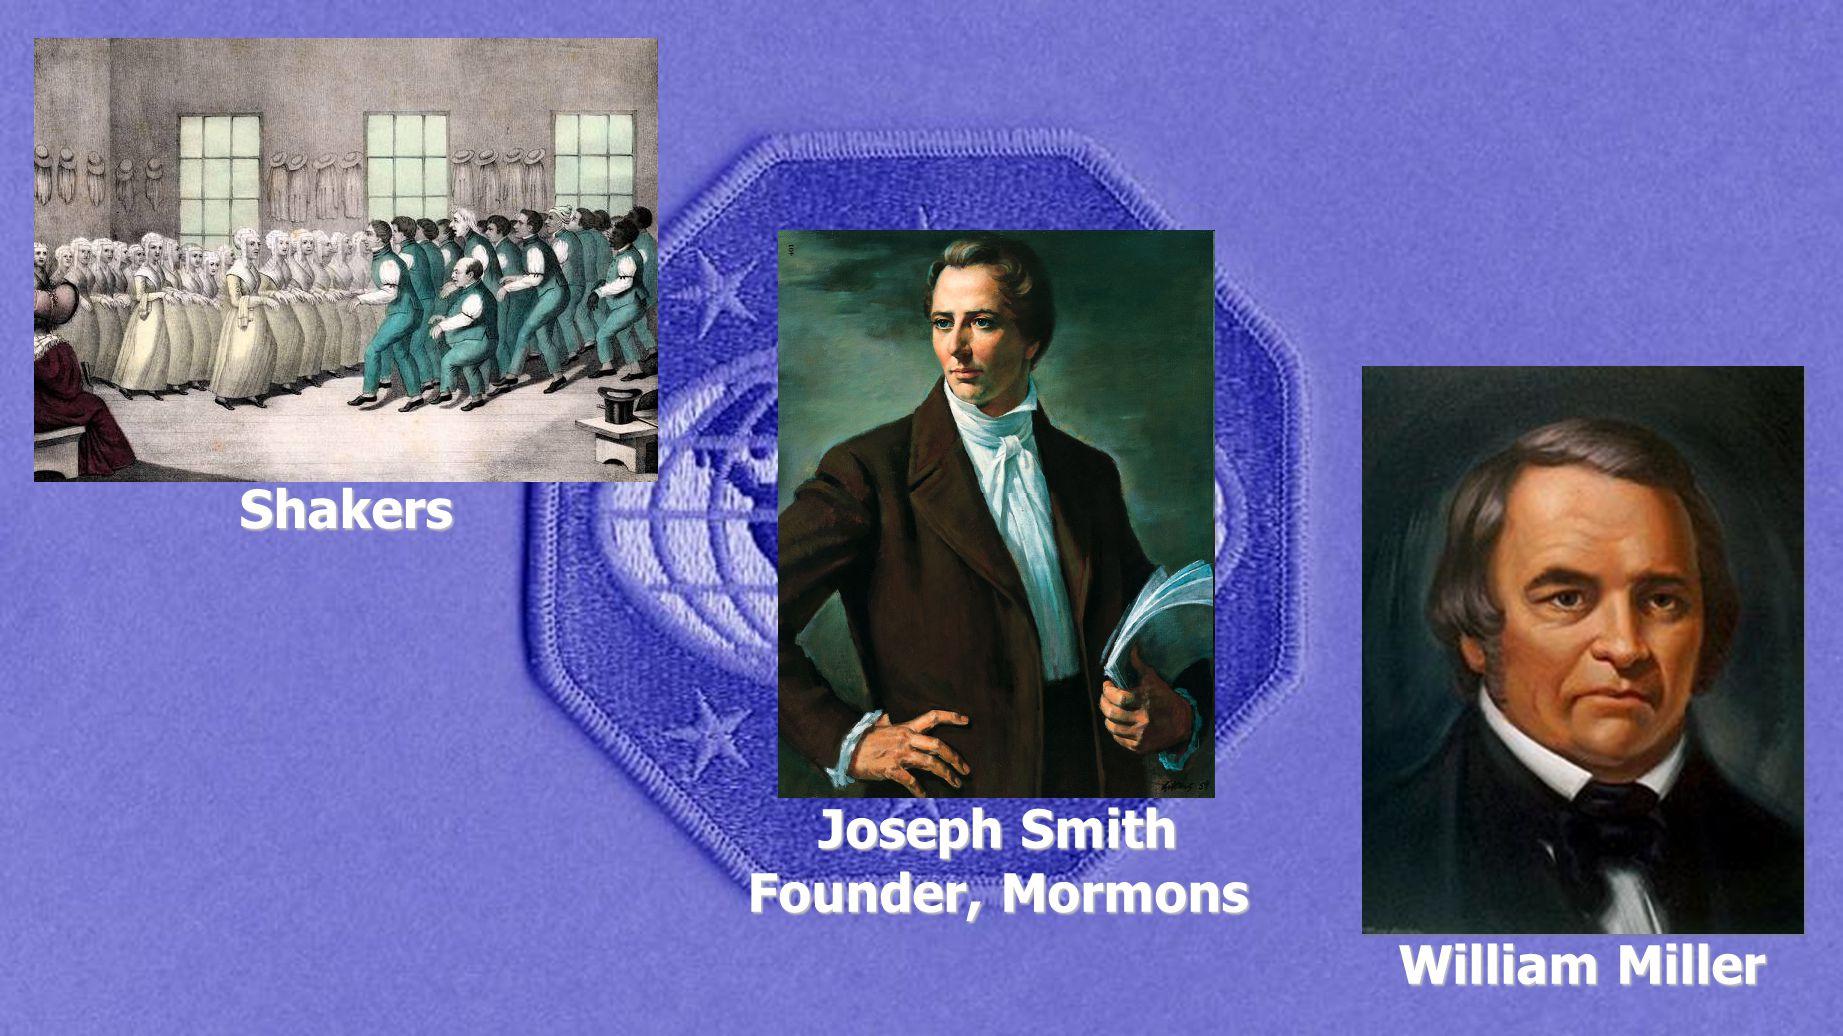 Shakers Joseph Smith Founder, Mormons William Miller